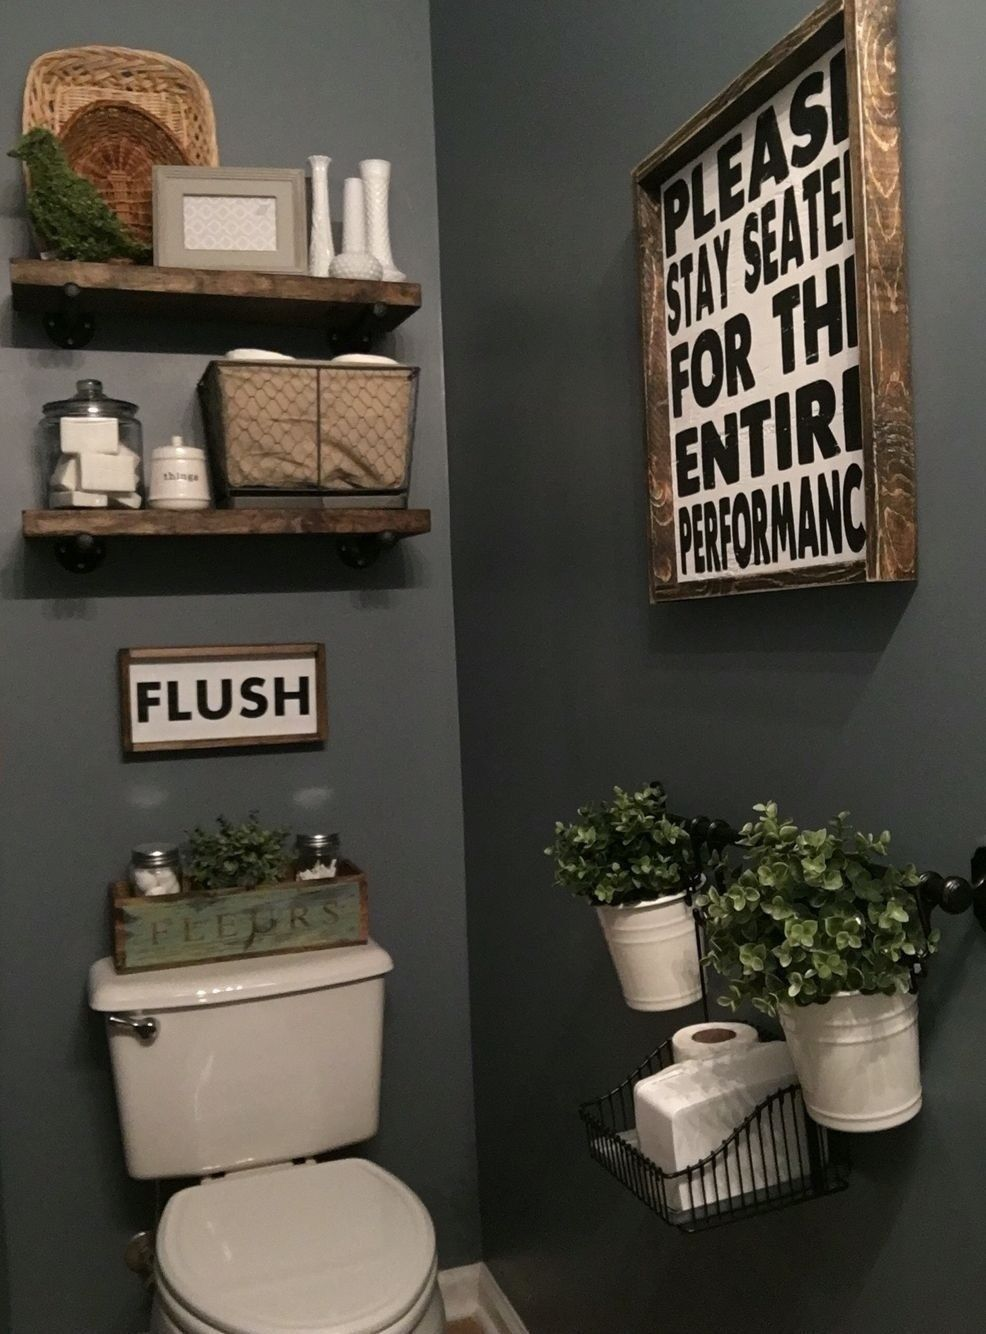 40 Spectacular Bathroom Picture And Wall Art Decor Ideas Affordable Bathroom Remodel Bathroom Wall Decor Bathroom Pictures